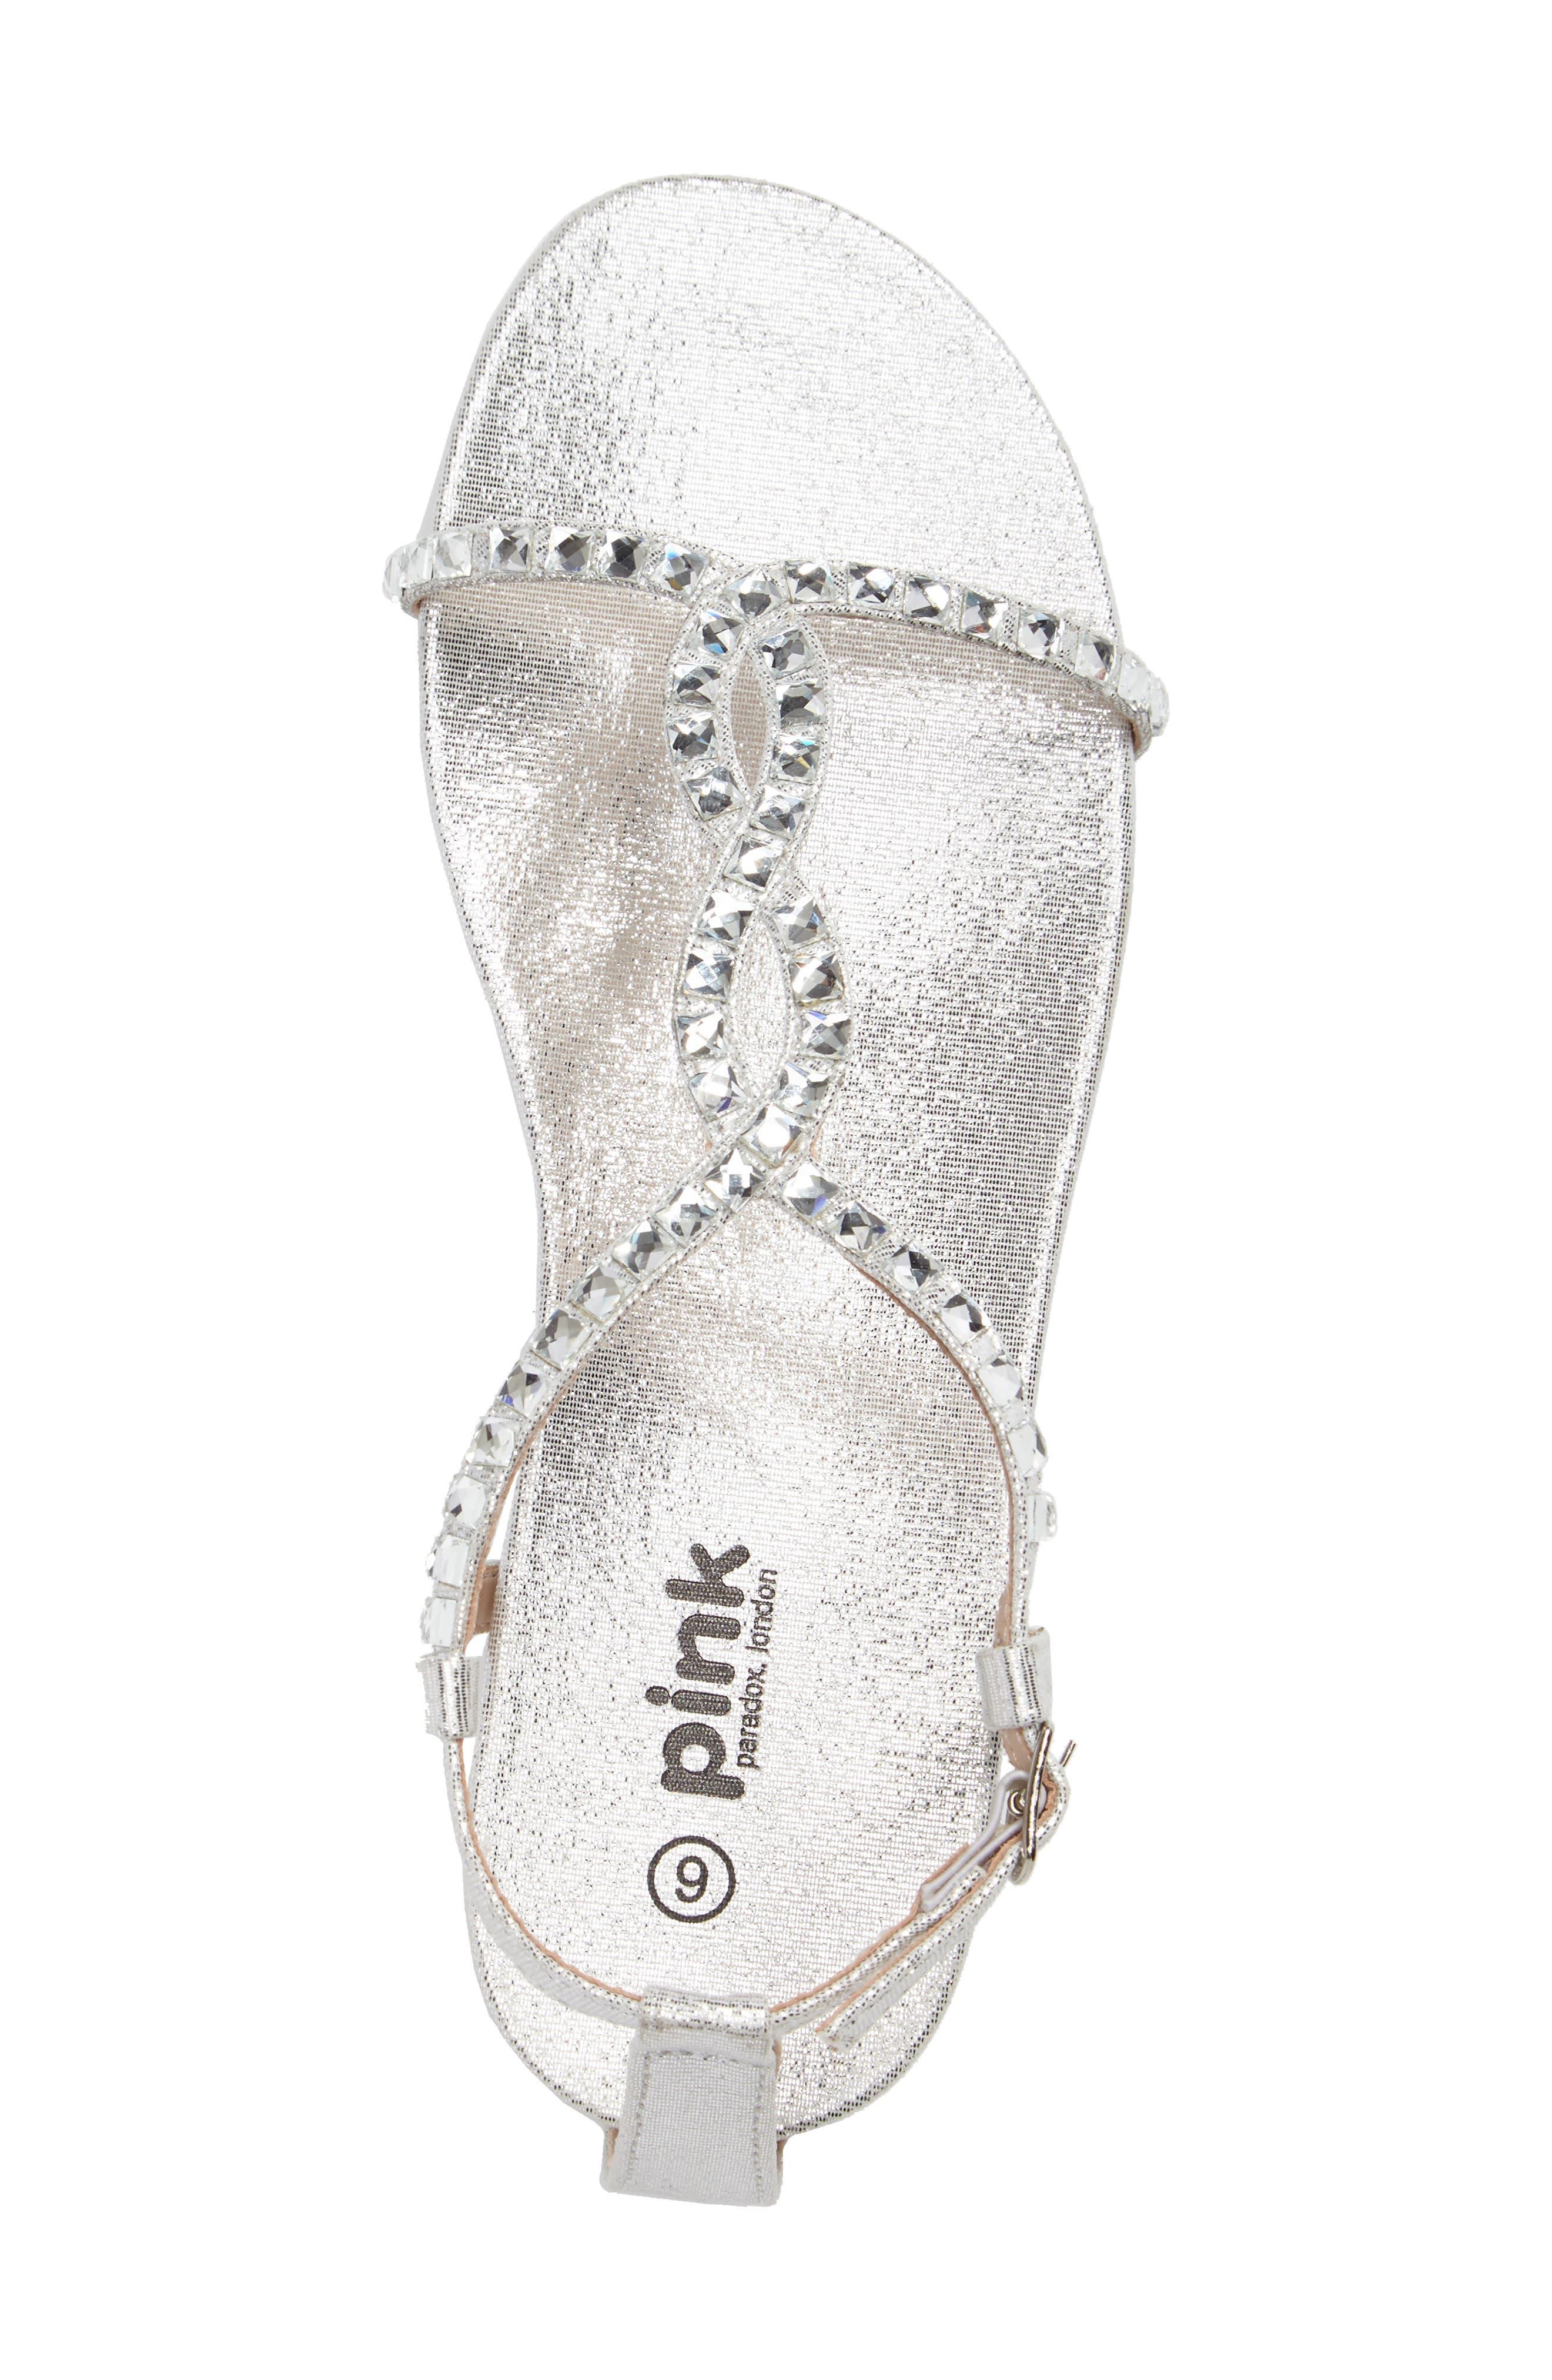 Kaylee Ankle Strap Sandal,                             Alternate thumbnail 3, color,                             SILVER